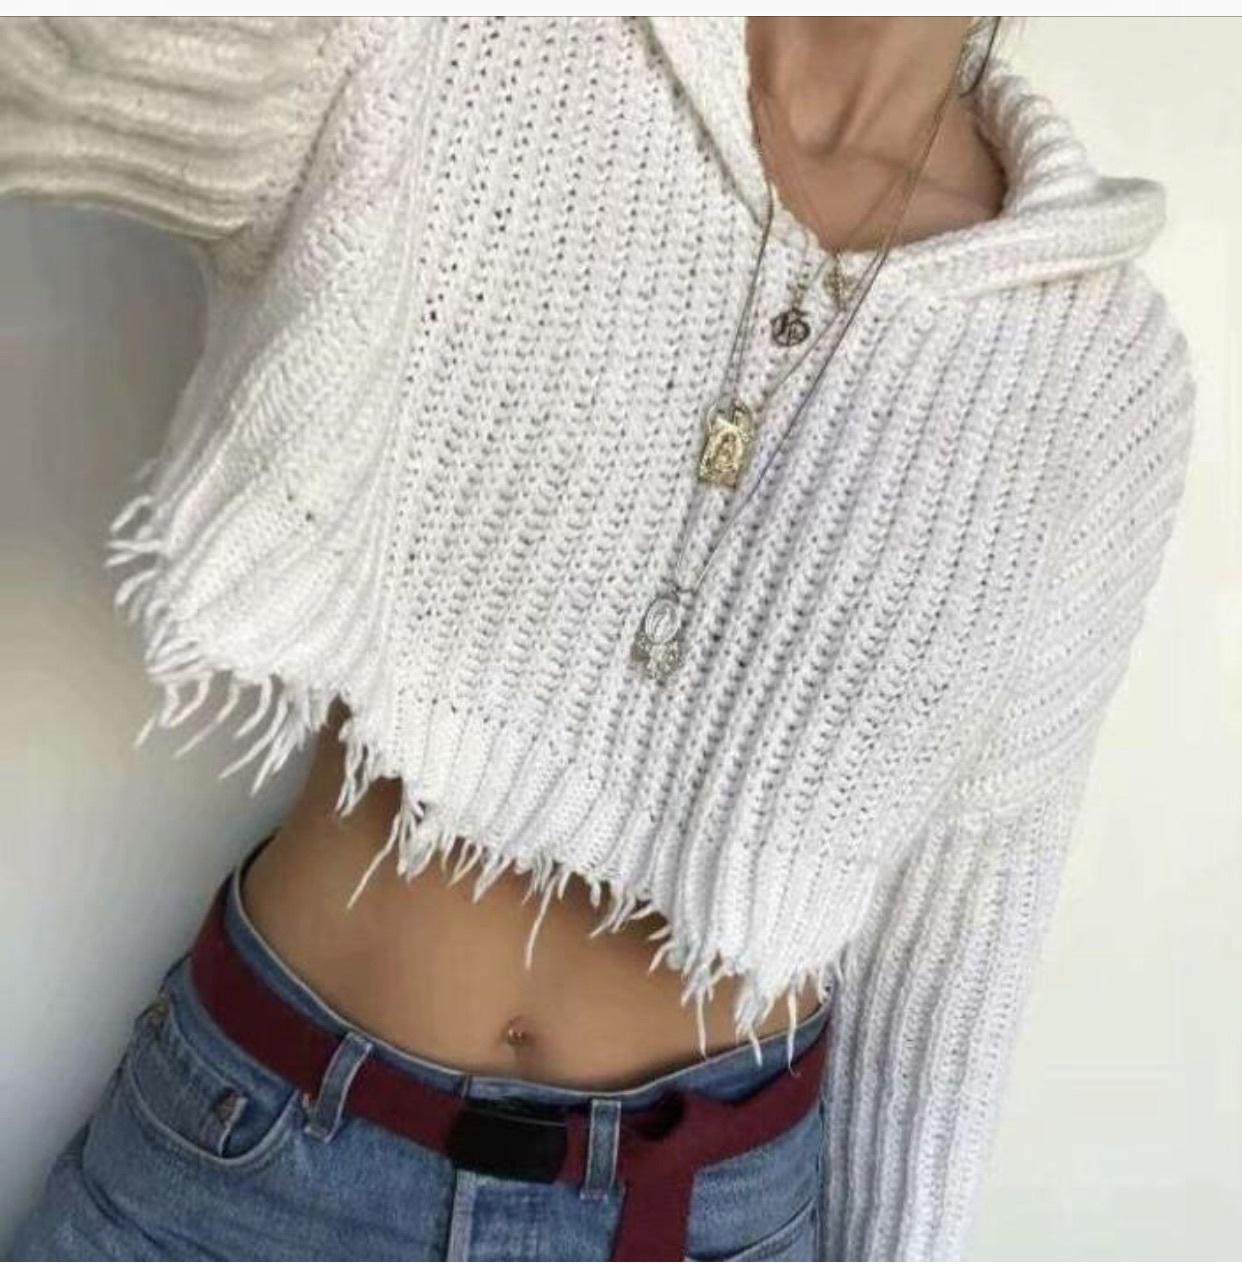 sweater girly girl girly wishlist white crop cropped cropped sweater crop tops cropped hoodie hoodie frayed cute knitwear knit knitted sweater itgirl itgirl shop itgirl clothing itgirlclothing itgirlshop